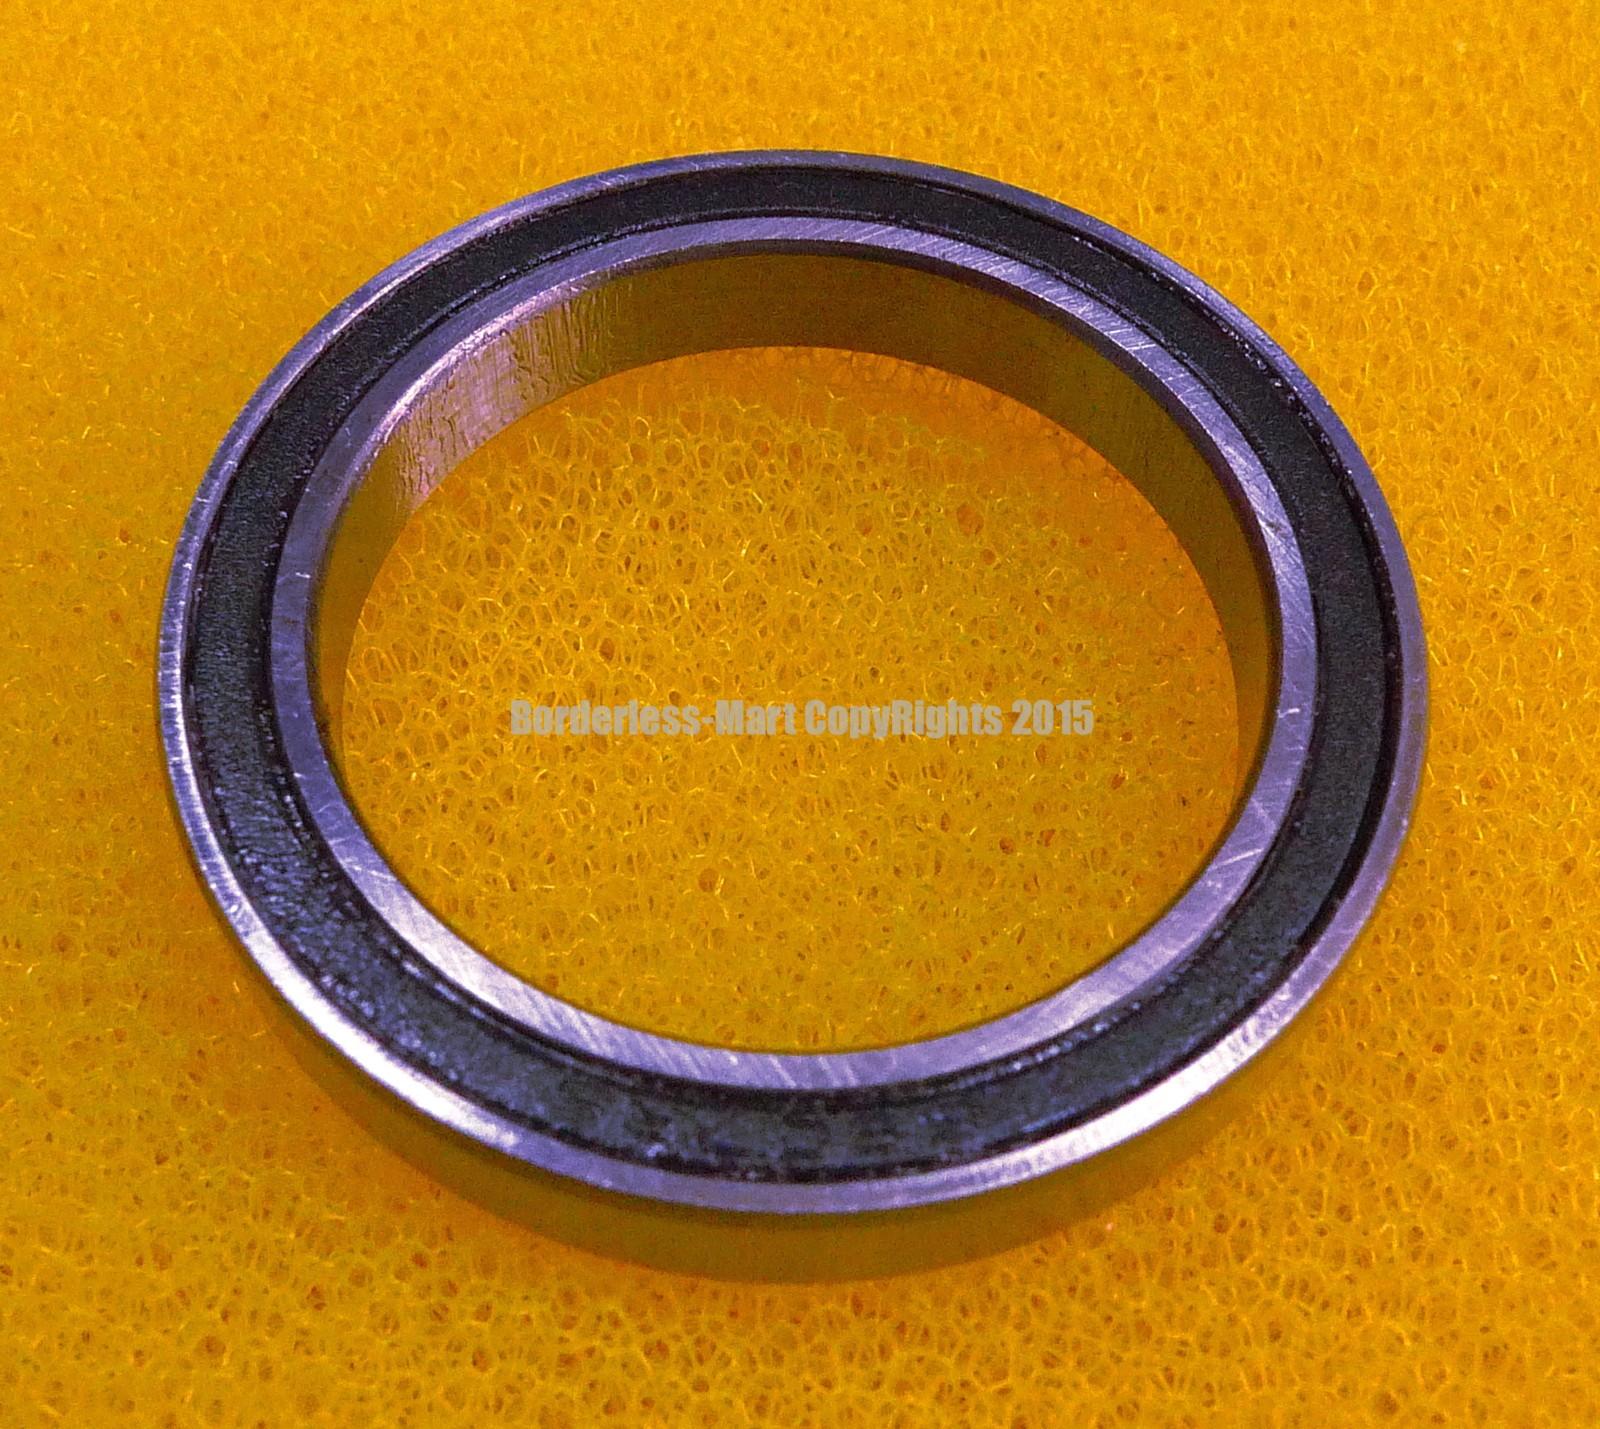 Metal Rubber Ball Bearing Bearings BLACK 6806RS 30x42x7 mm 6806-2RS 5 PCS